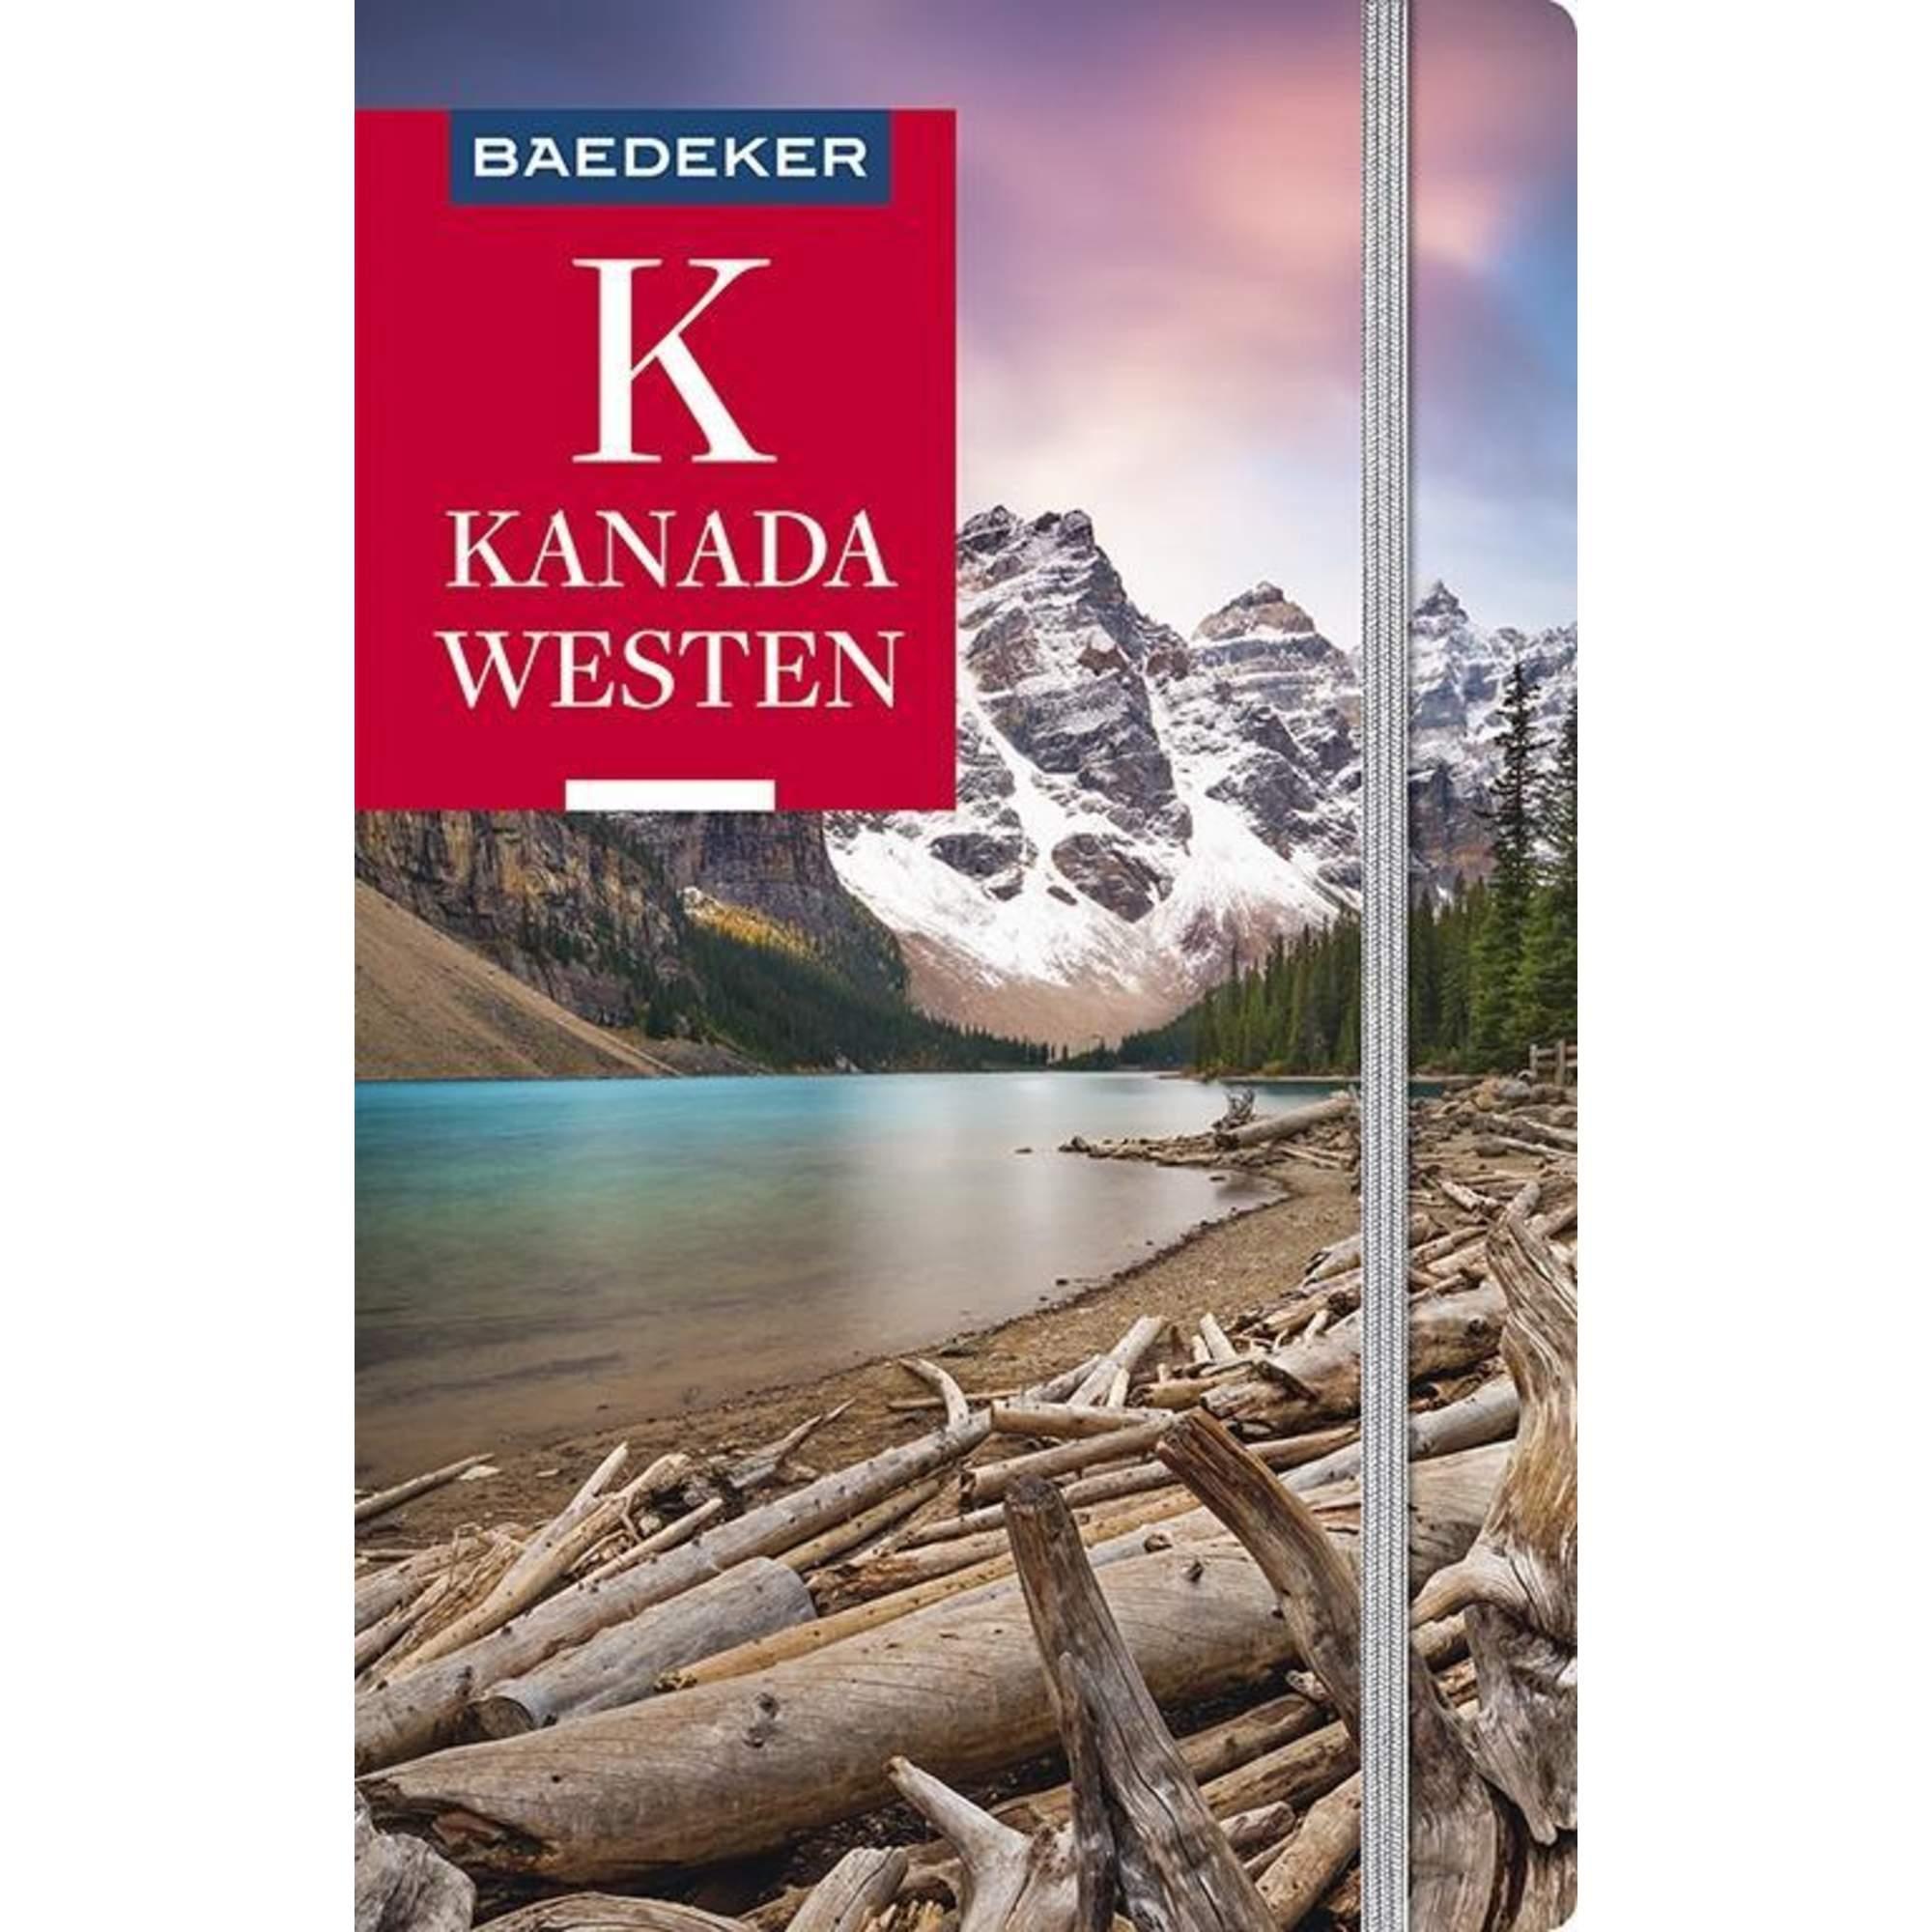 Baedeker Reiseführer Kanada Westen, 25,99 Euro